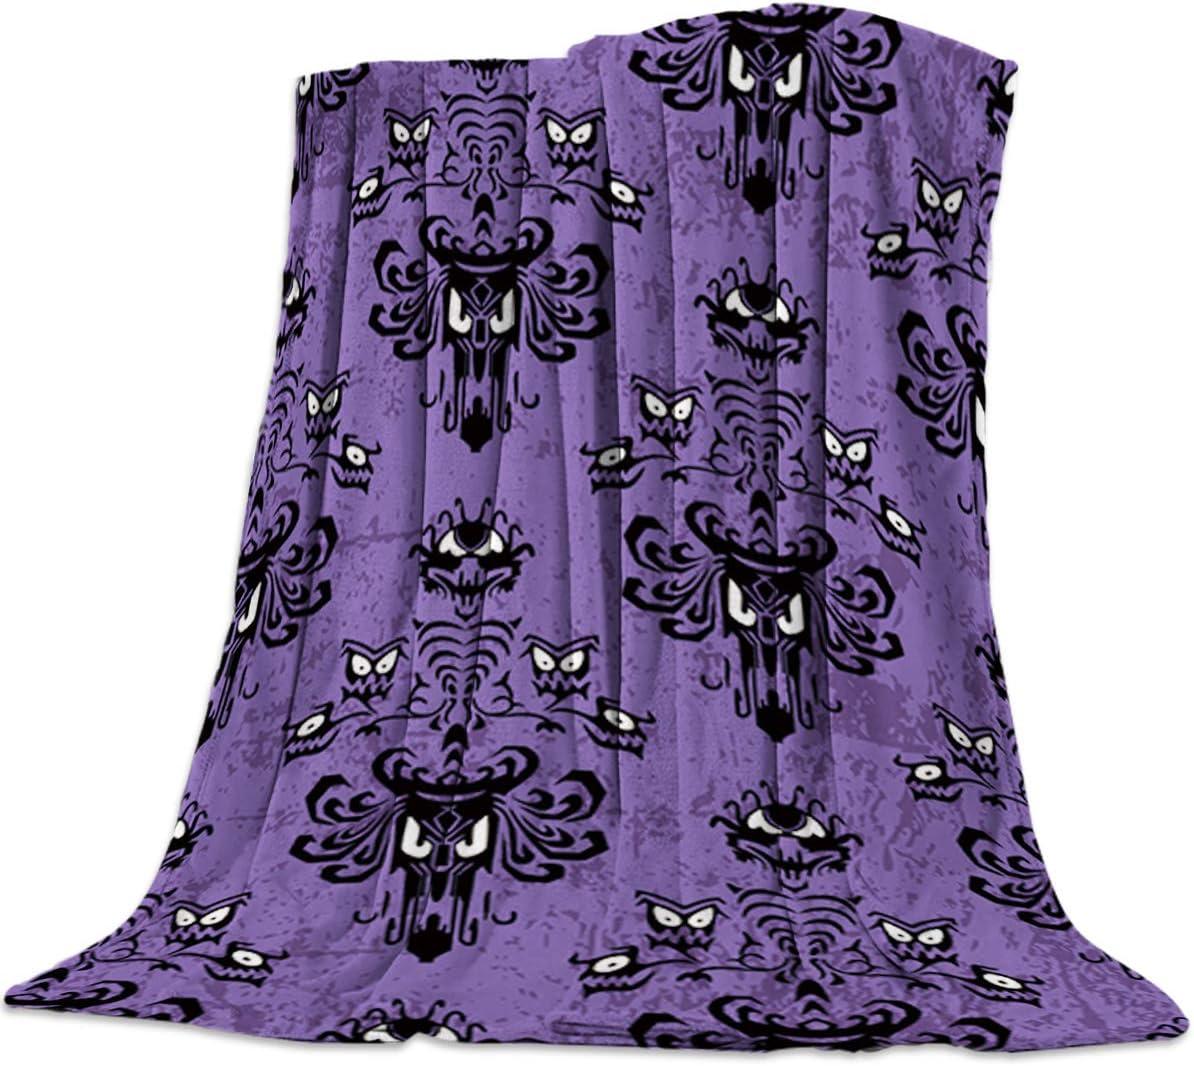 "T&H Home Flannel Fleece Bedding Blanket - 60""x80"" Haunted Mansion - Grim Grinning Ghosts Anime Weighted Camp Throw Blanket for Baby Kids Boy Girls Men Women"